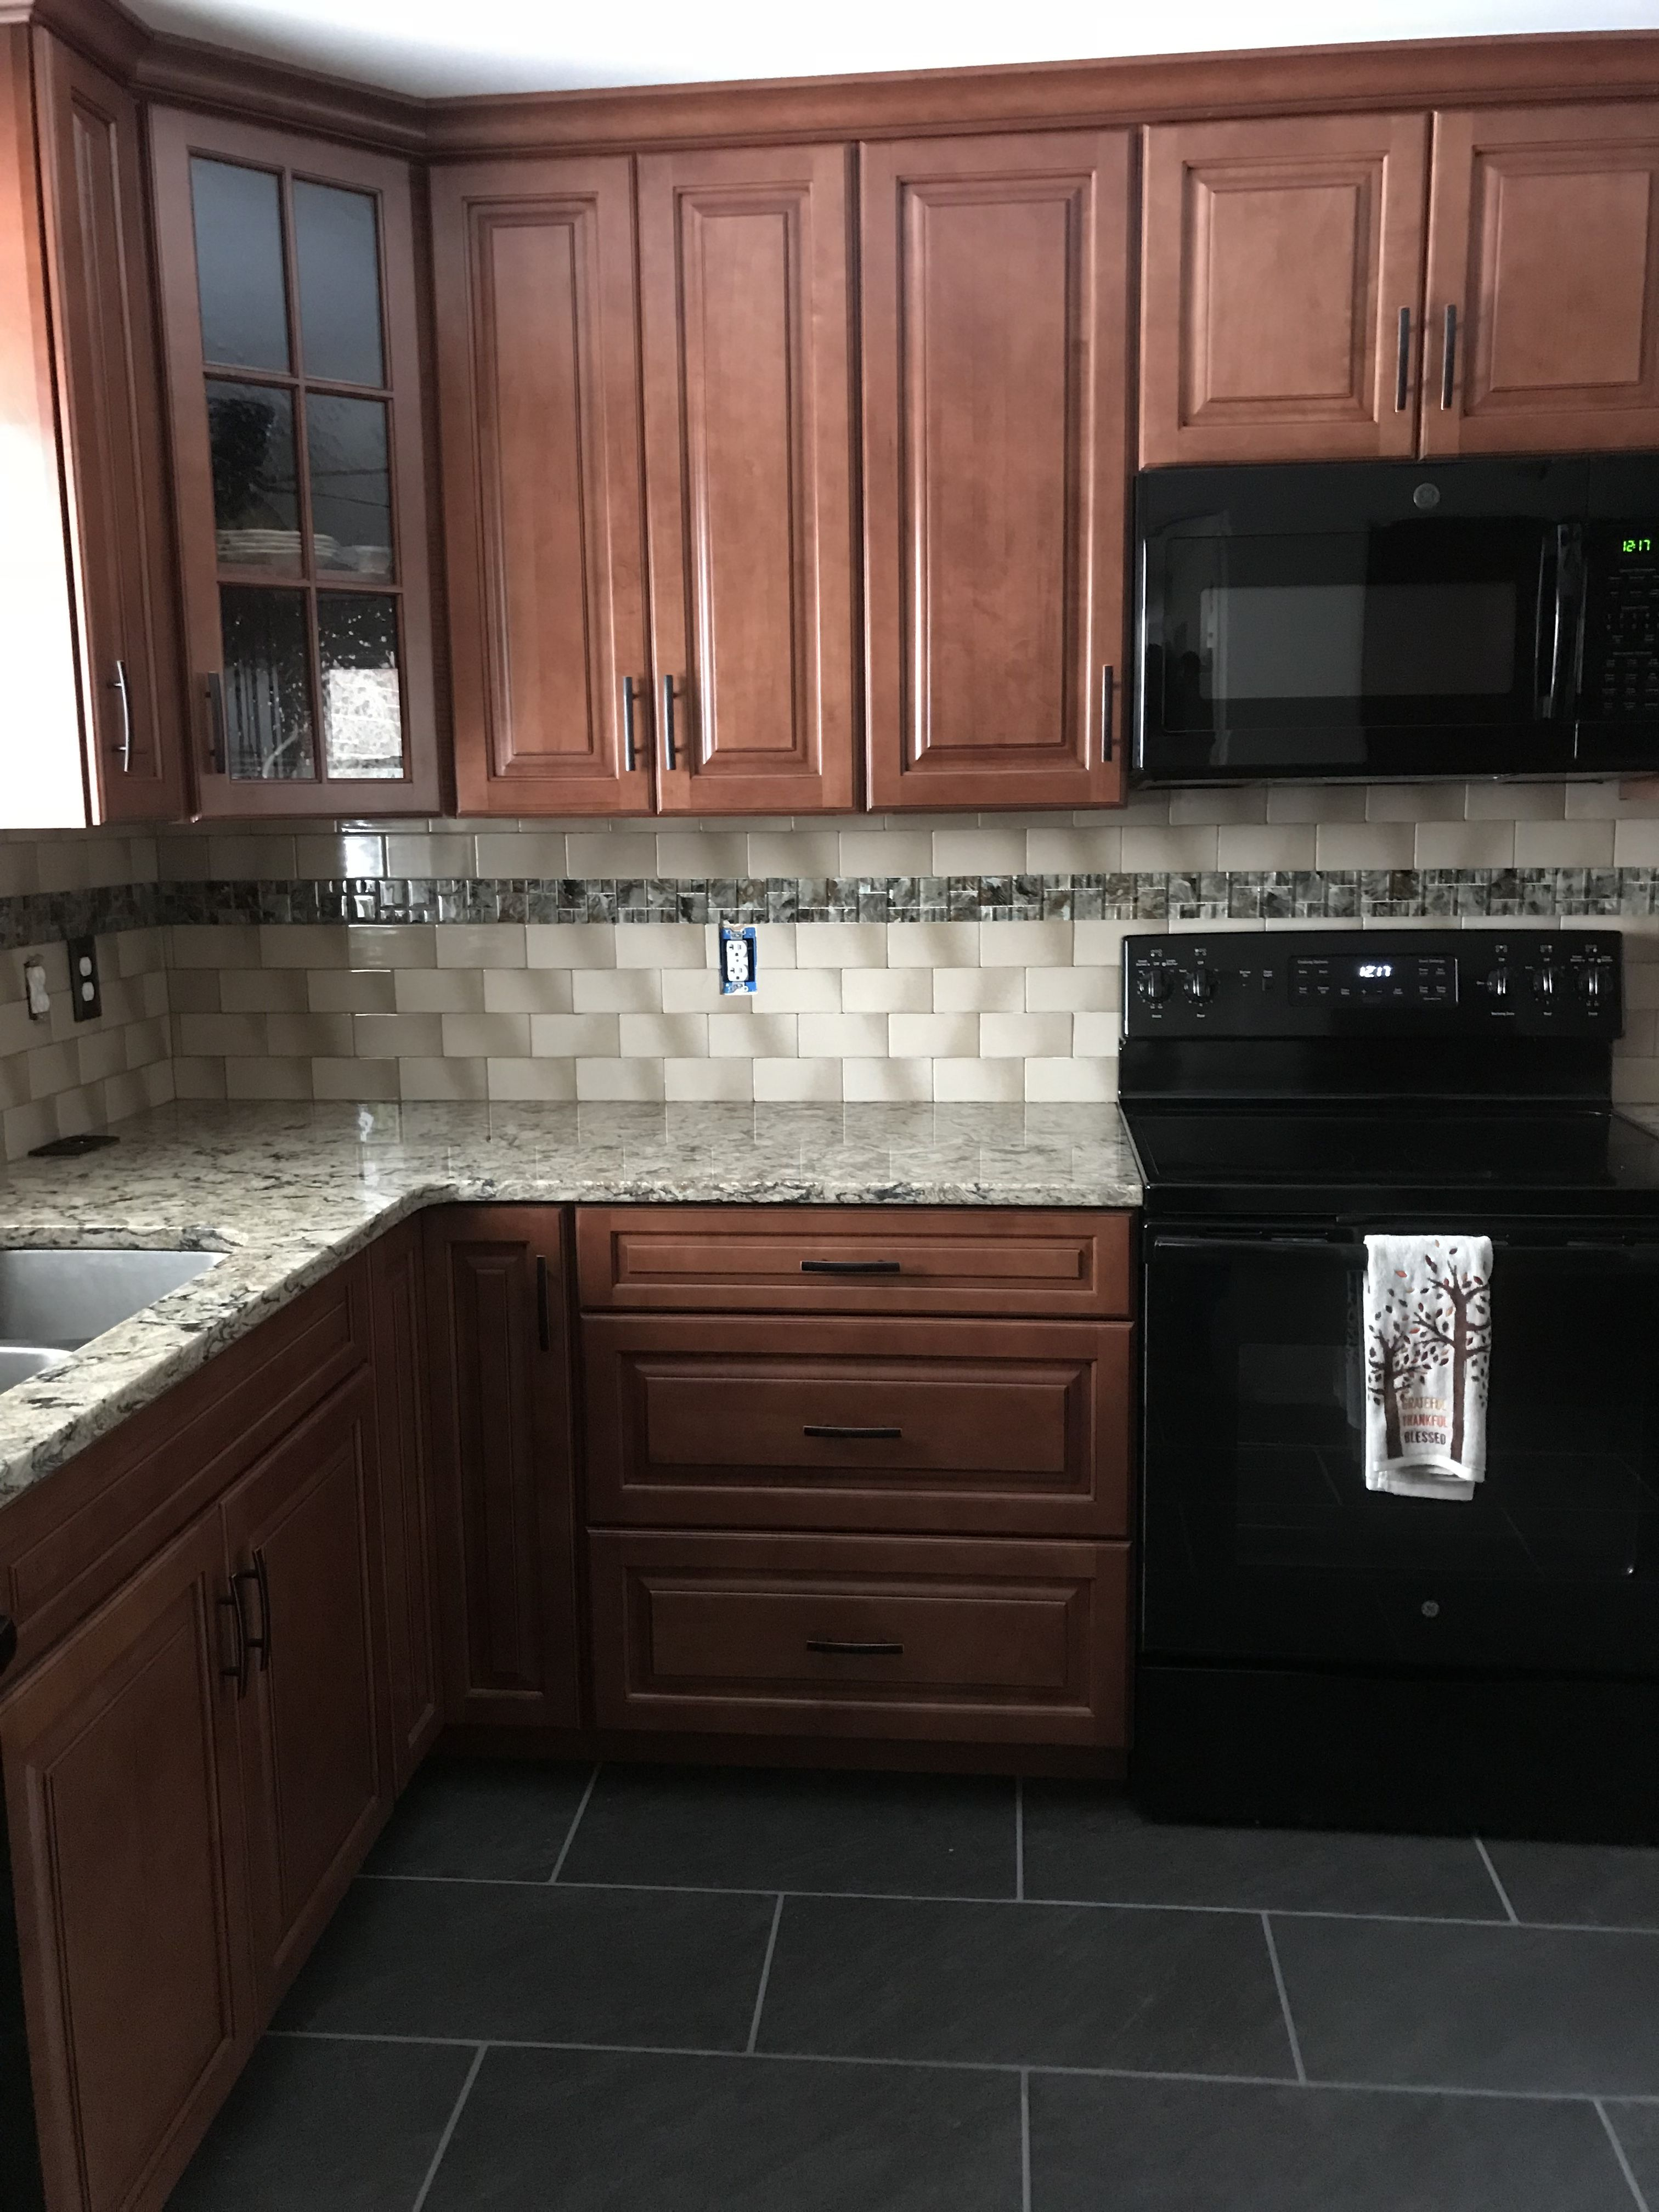 Waypoint Maple Auburn Glaze Cabinets/Cambria Bradshaw ... on Maple Kitchen Cabinets With Quartz Countertops  id=96280